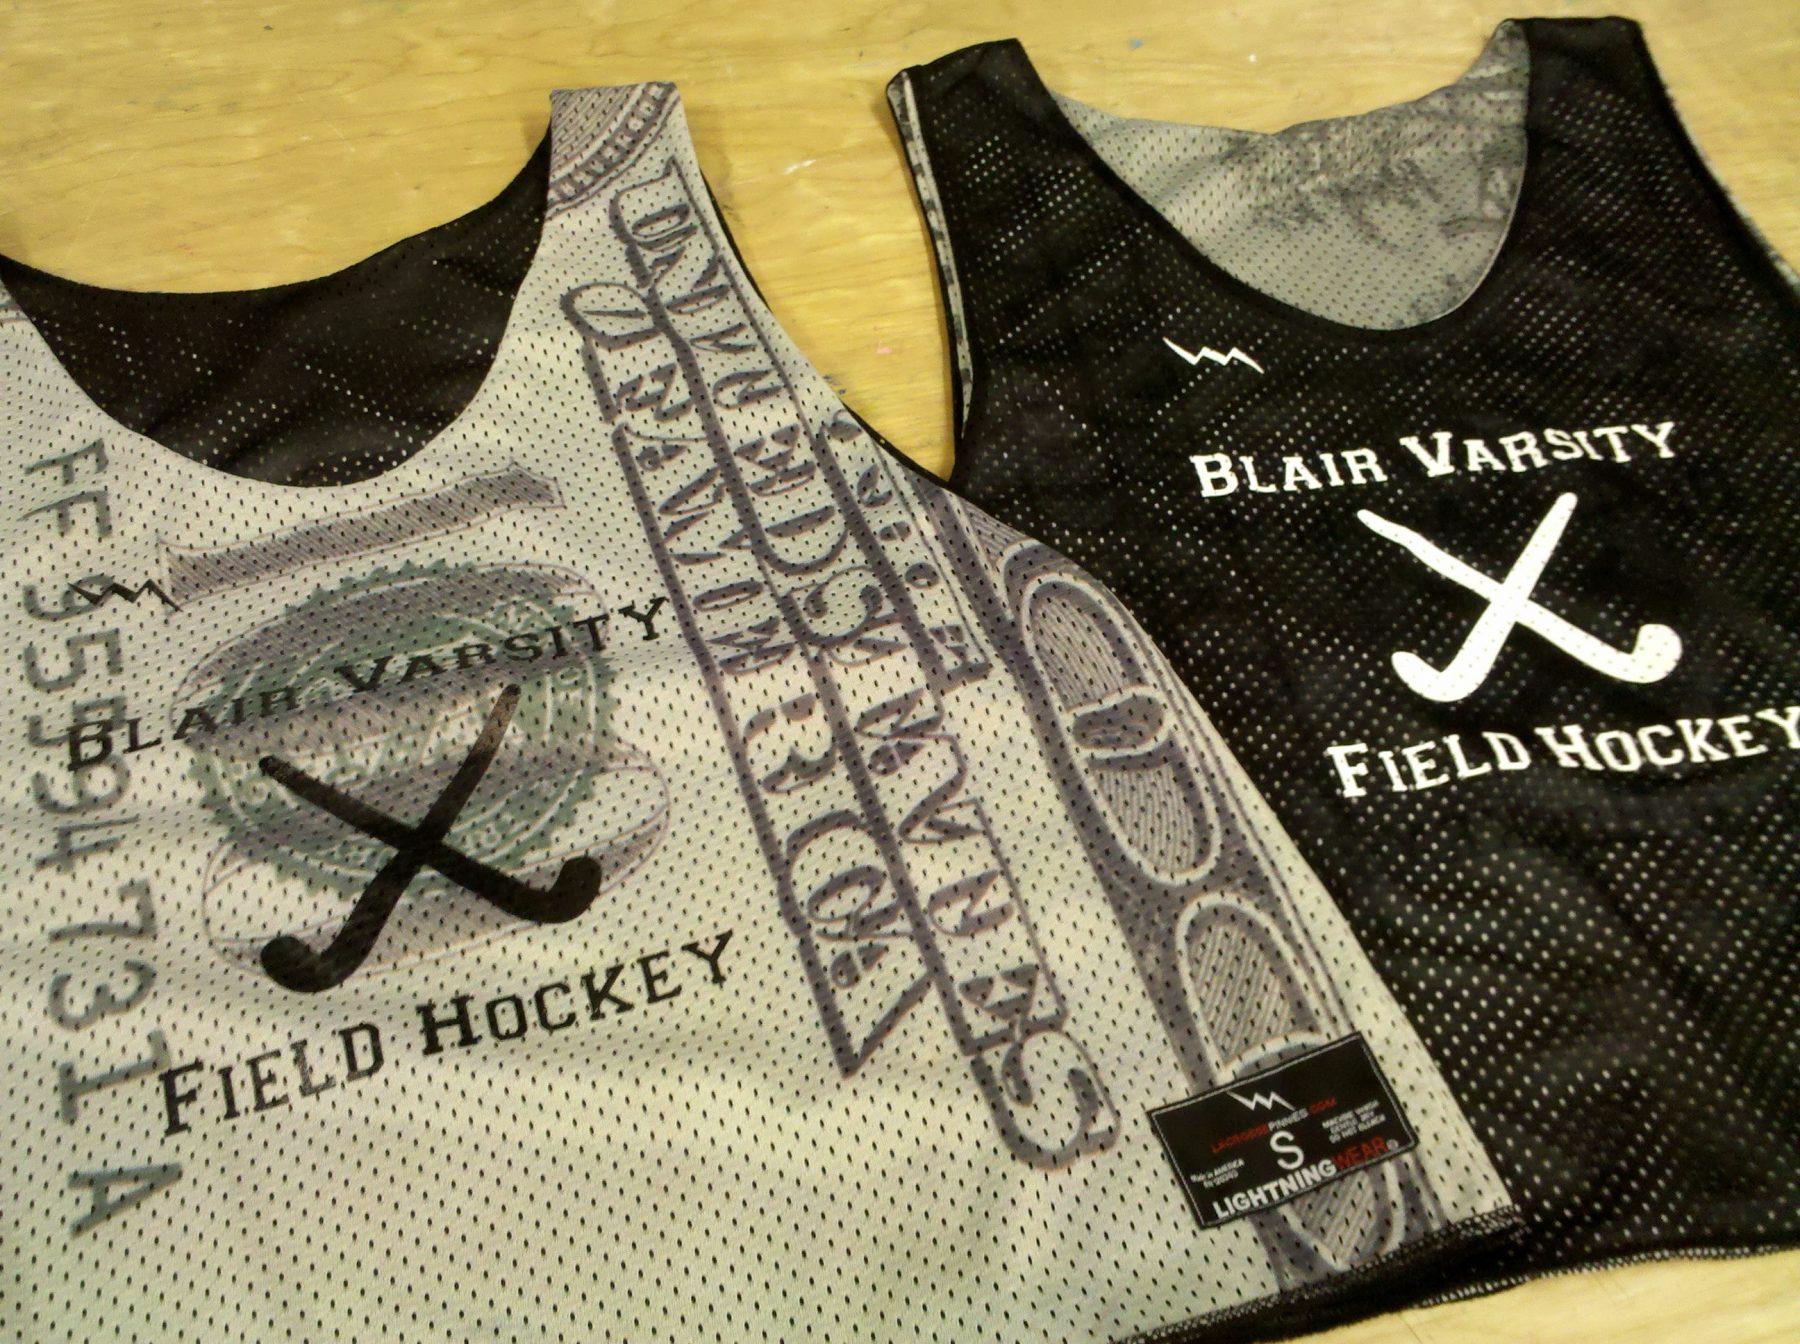 money field hockey pinnies